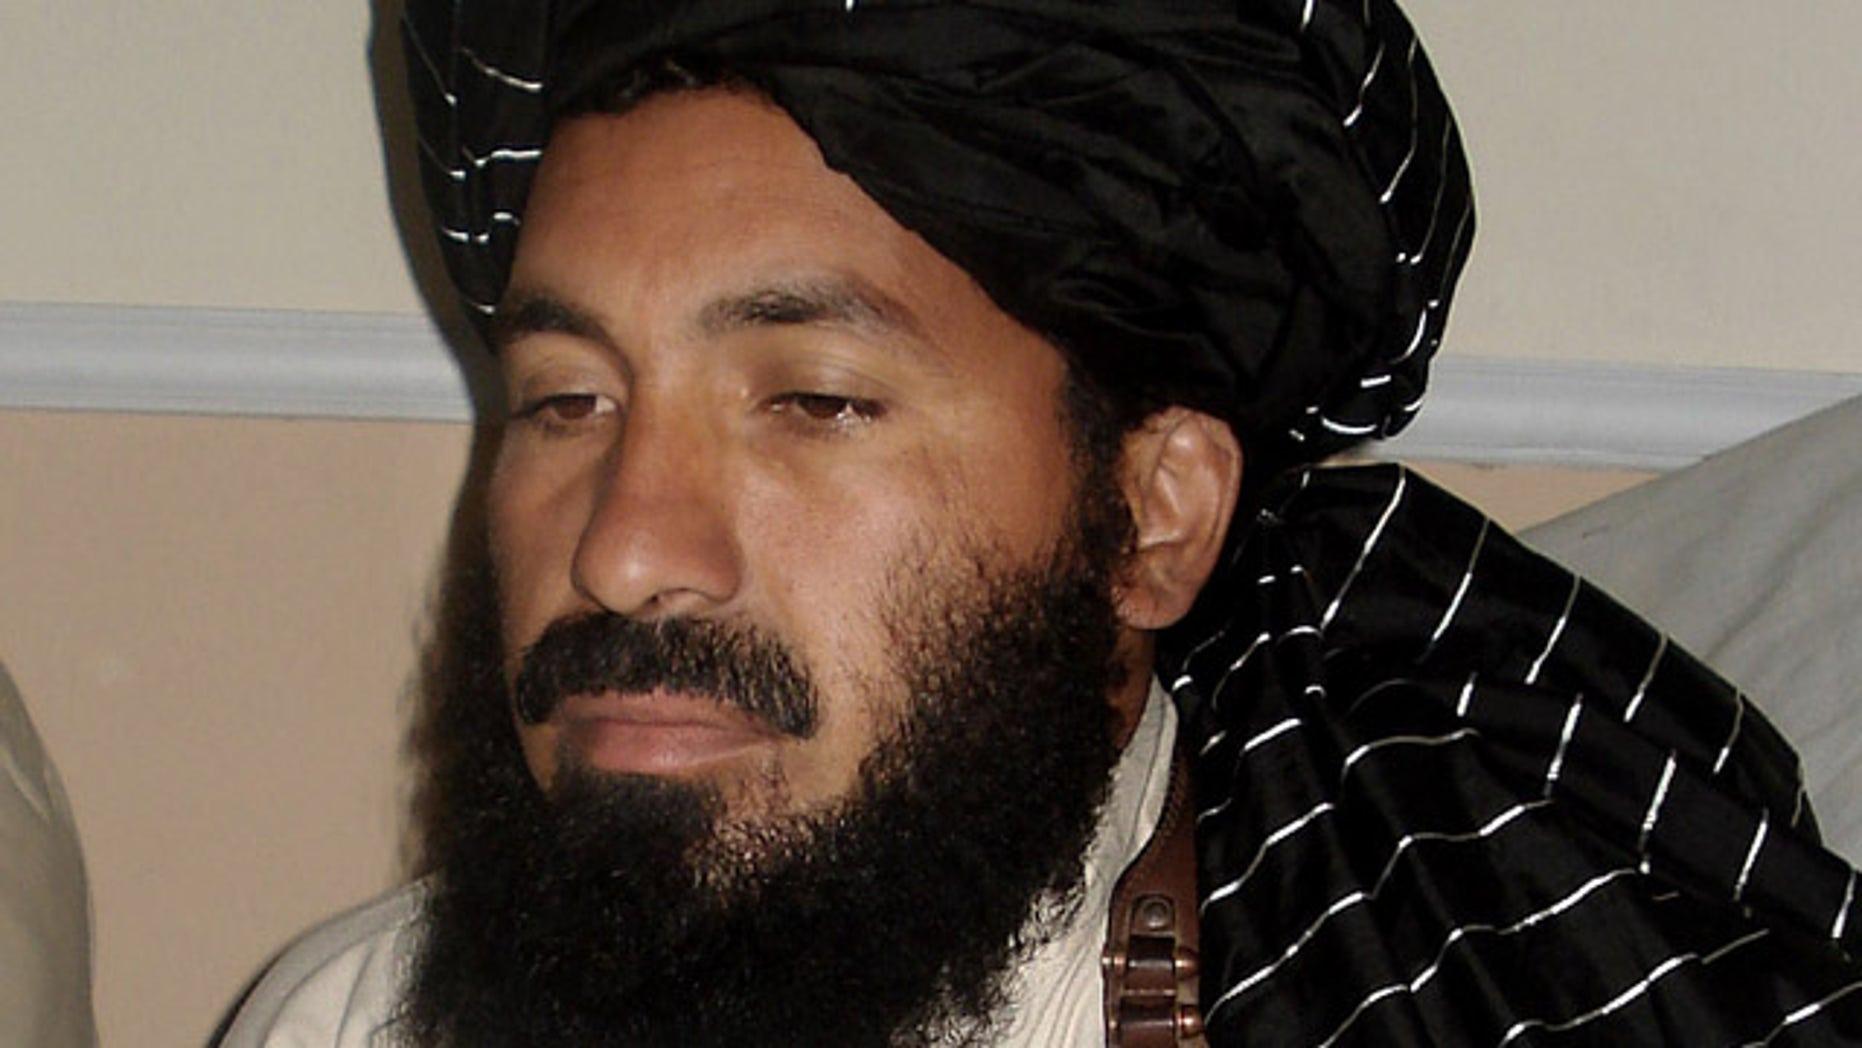 April, 20, 2007: Pakistani militant commander Maulvi Nazir meets his associates in South Waziristan near the Afghani border.